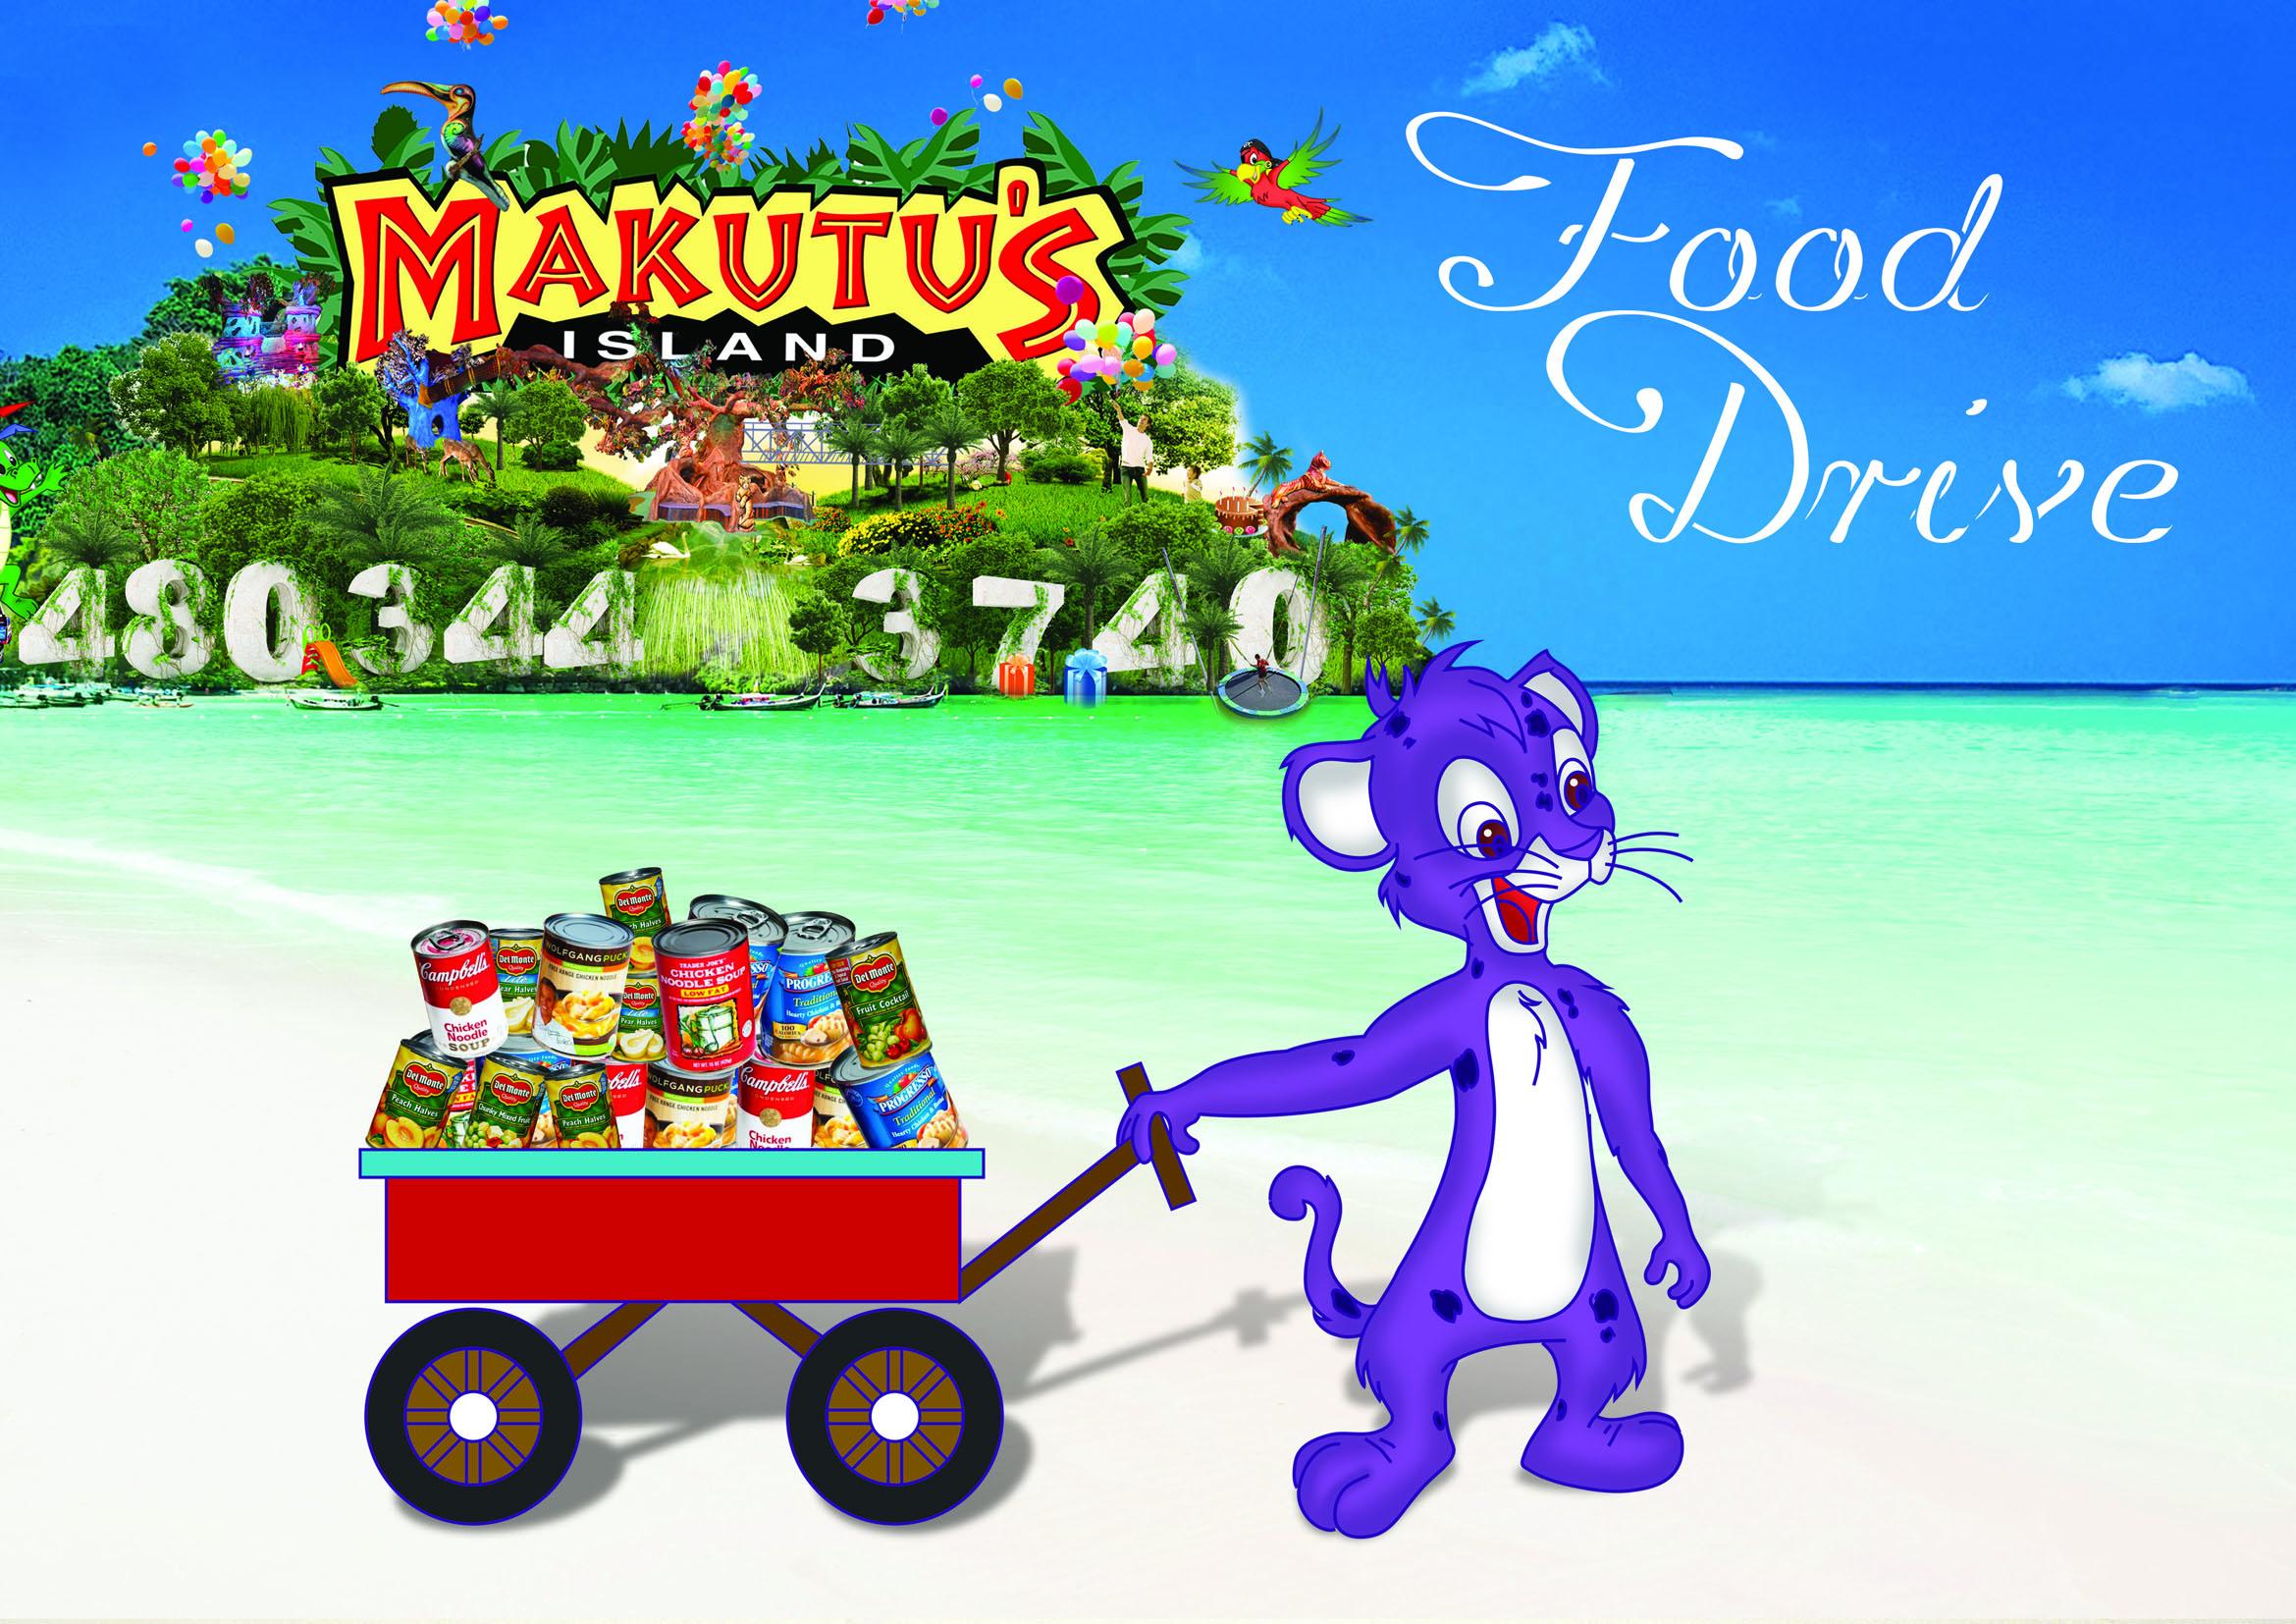 Makutu's island coupons discounts